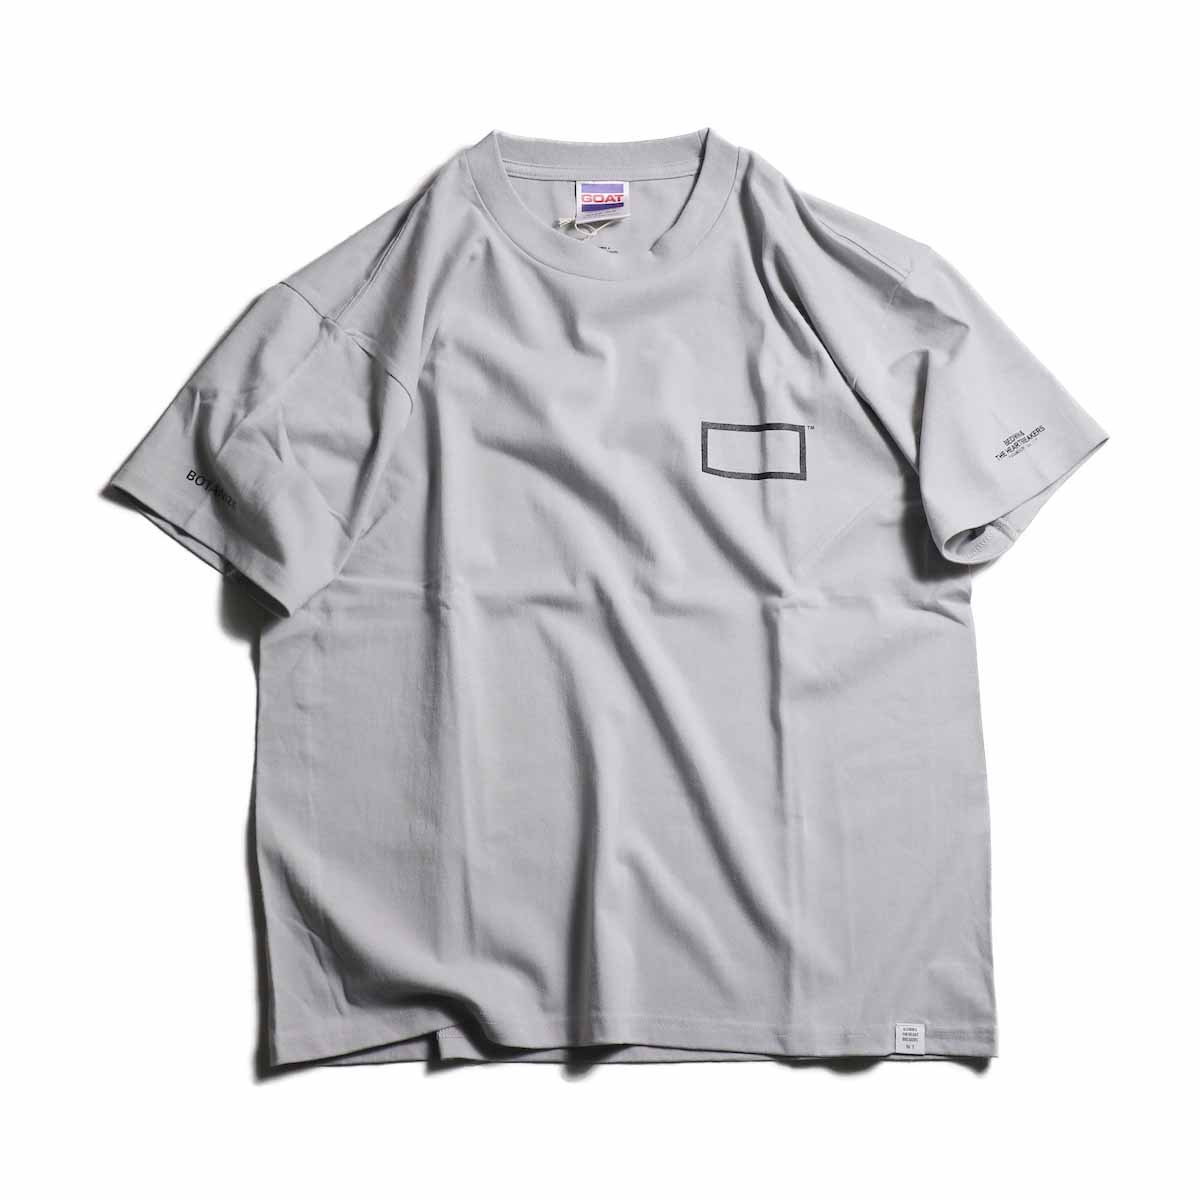 BEDWIN & THE HEARTBREAKERS × BOTANIZE Photo T-Shirts (gray)